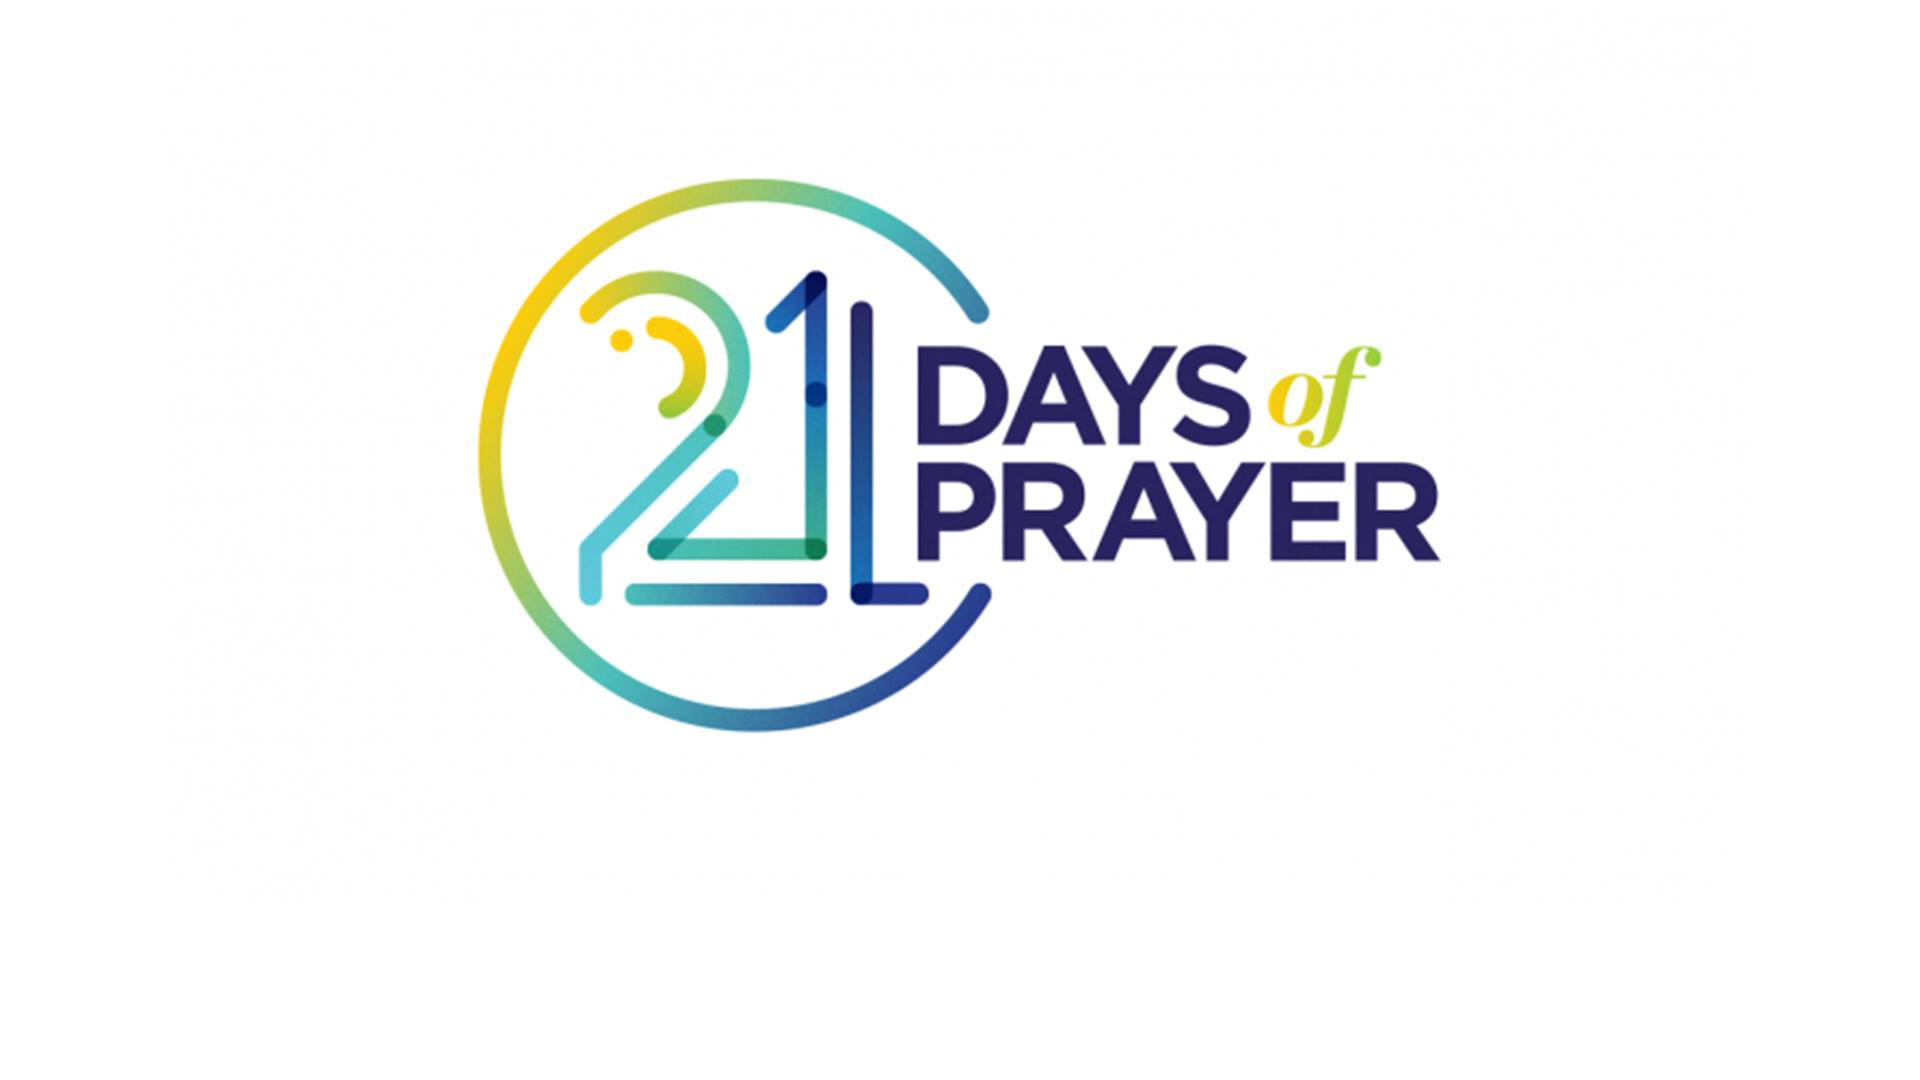 21_days_of_prayer.jpg